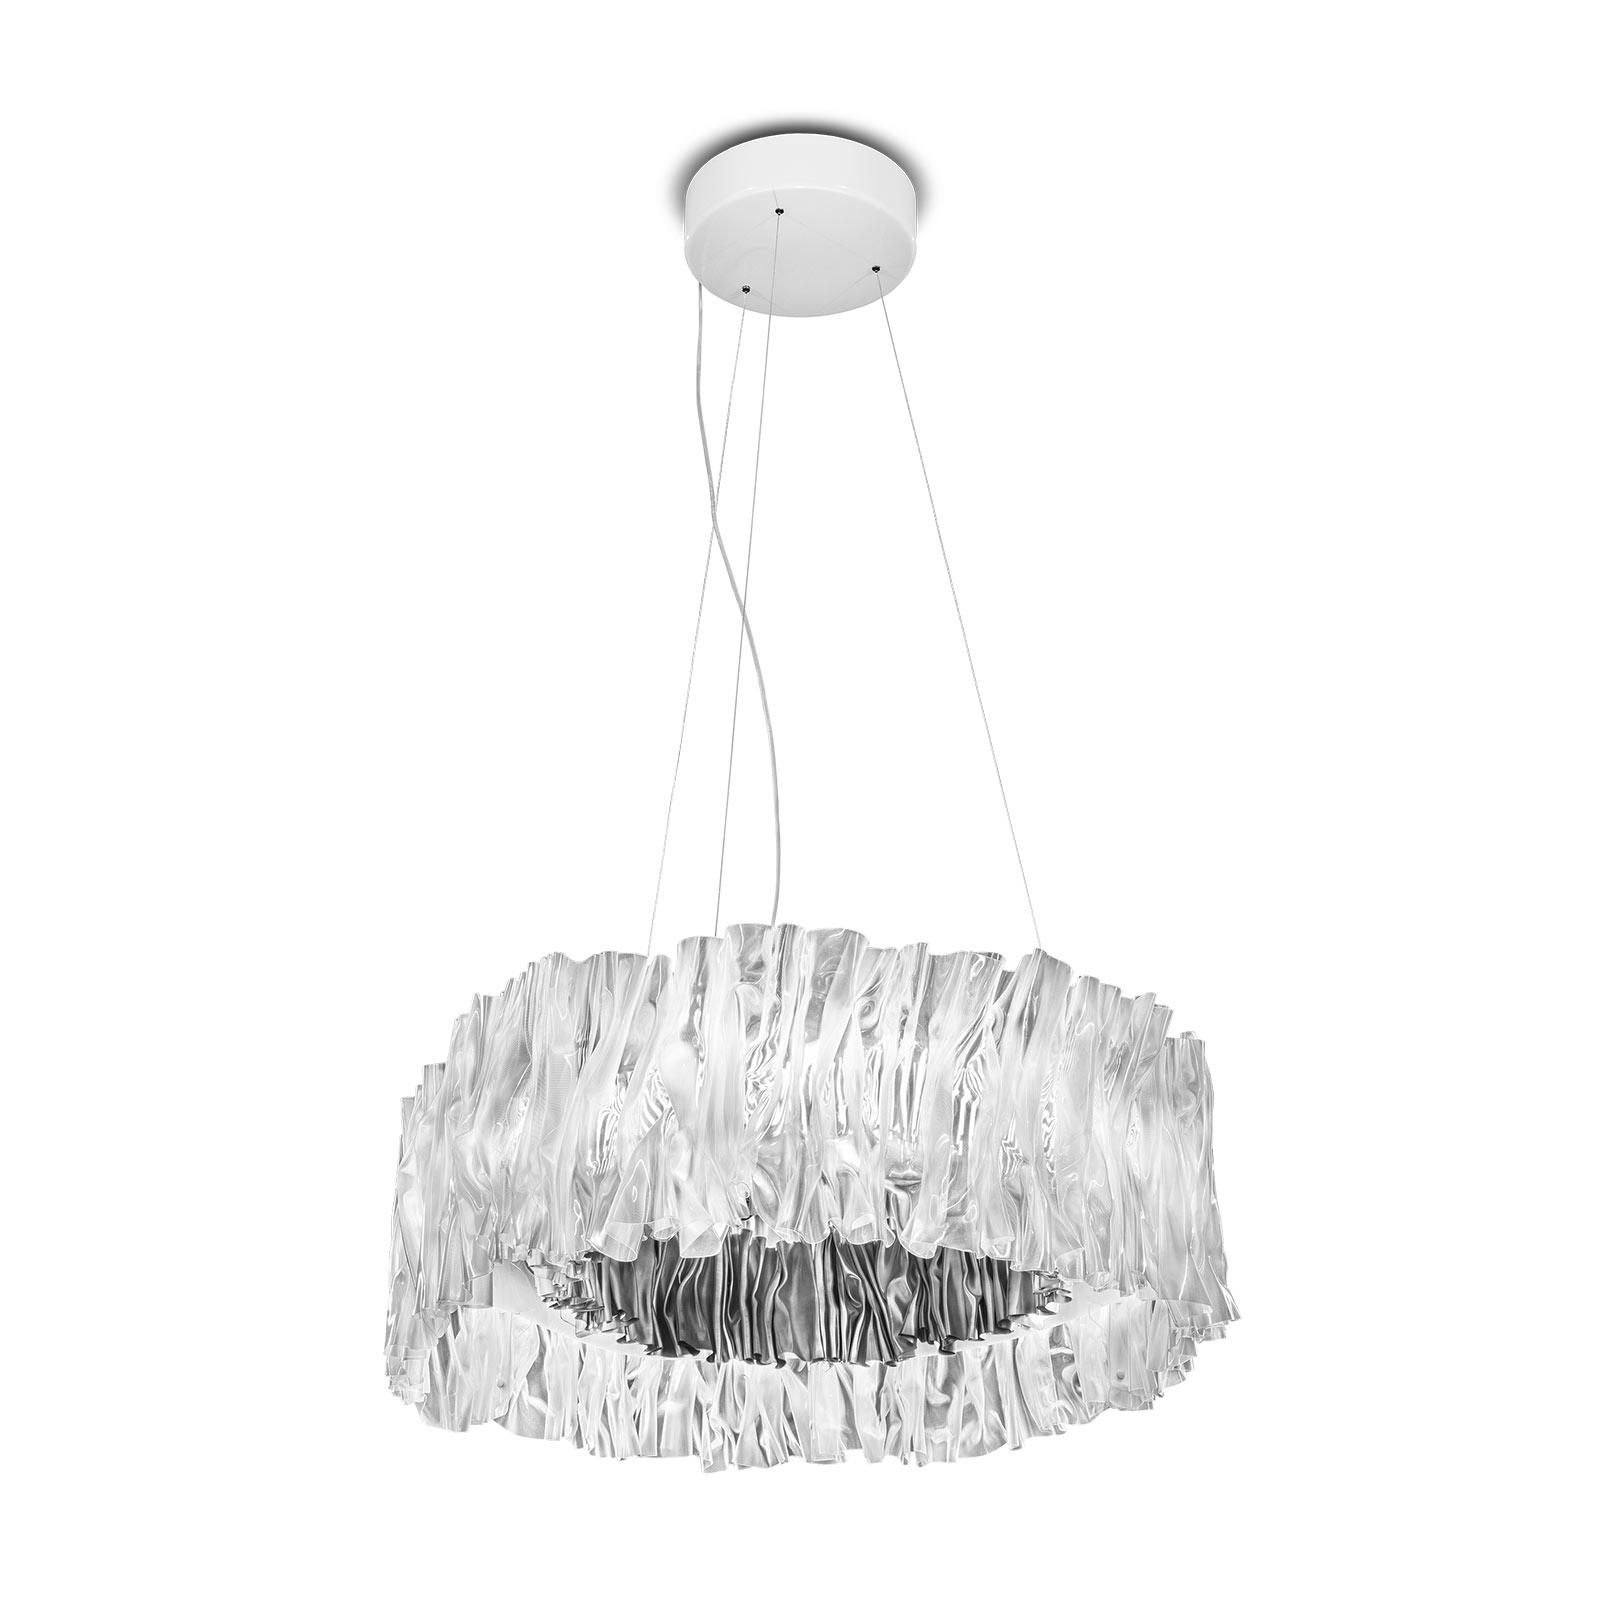 Slamp Accordéon LED-riippuvalaisin hopea 3°000°K